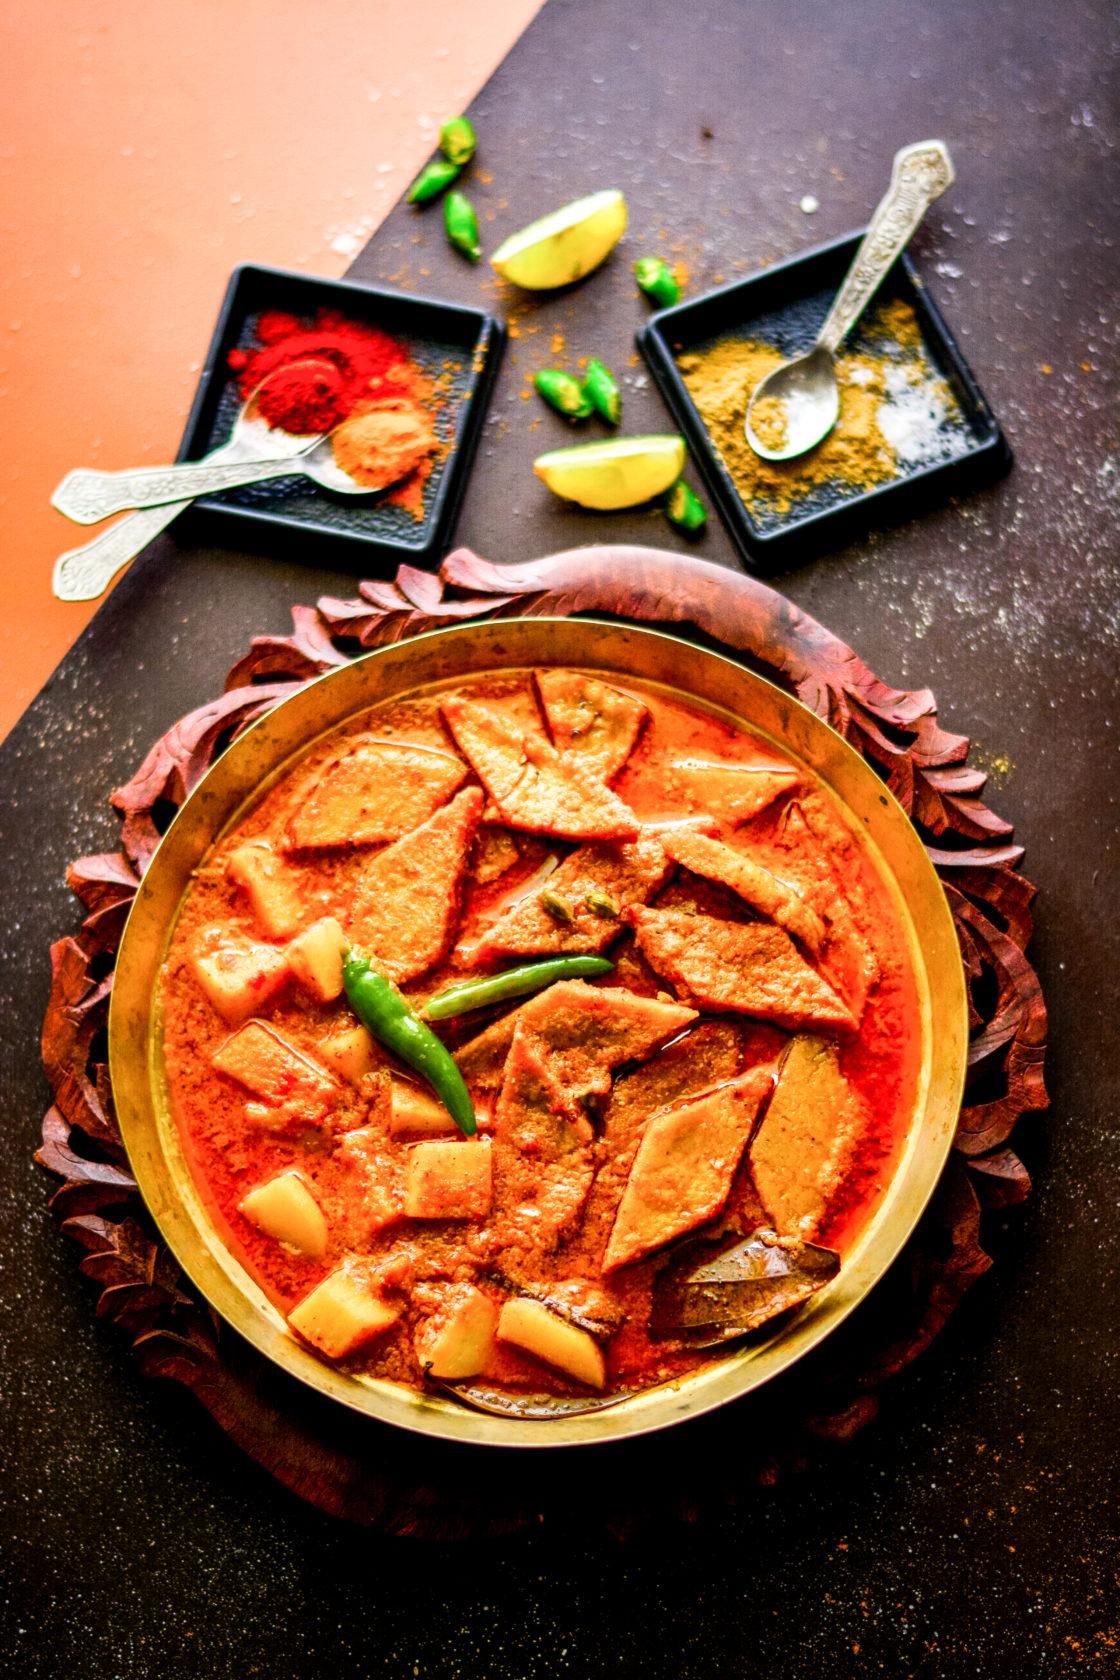 Niramish Dhokar Dalna / Bengali Style Fried Lentil Cakes in Tomato Curry